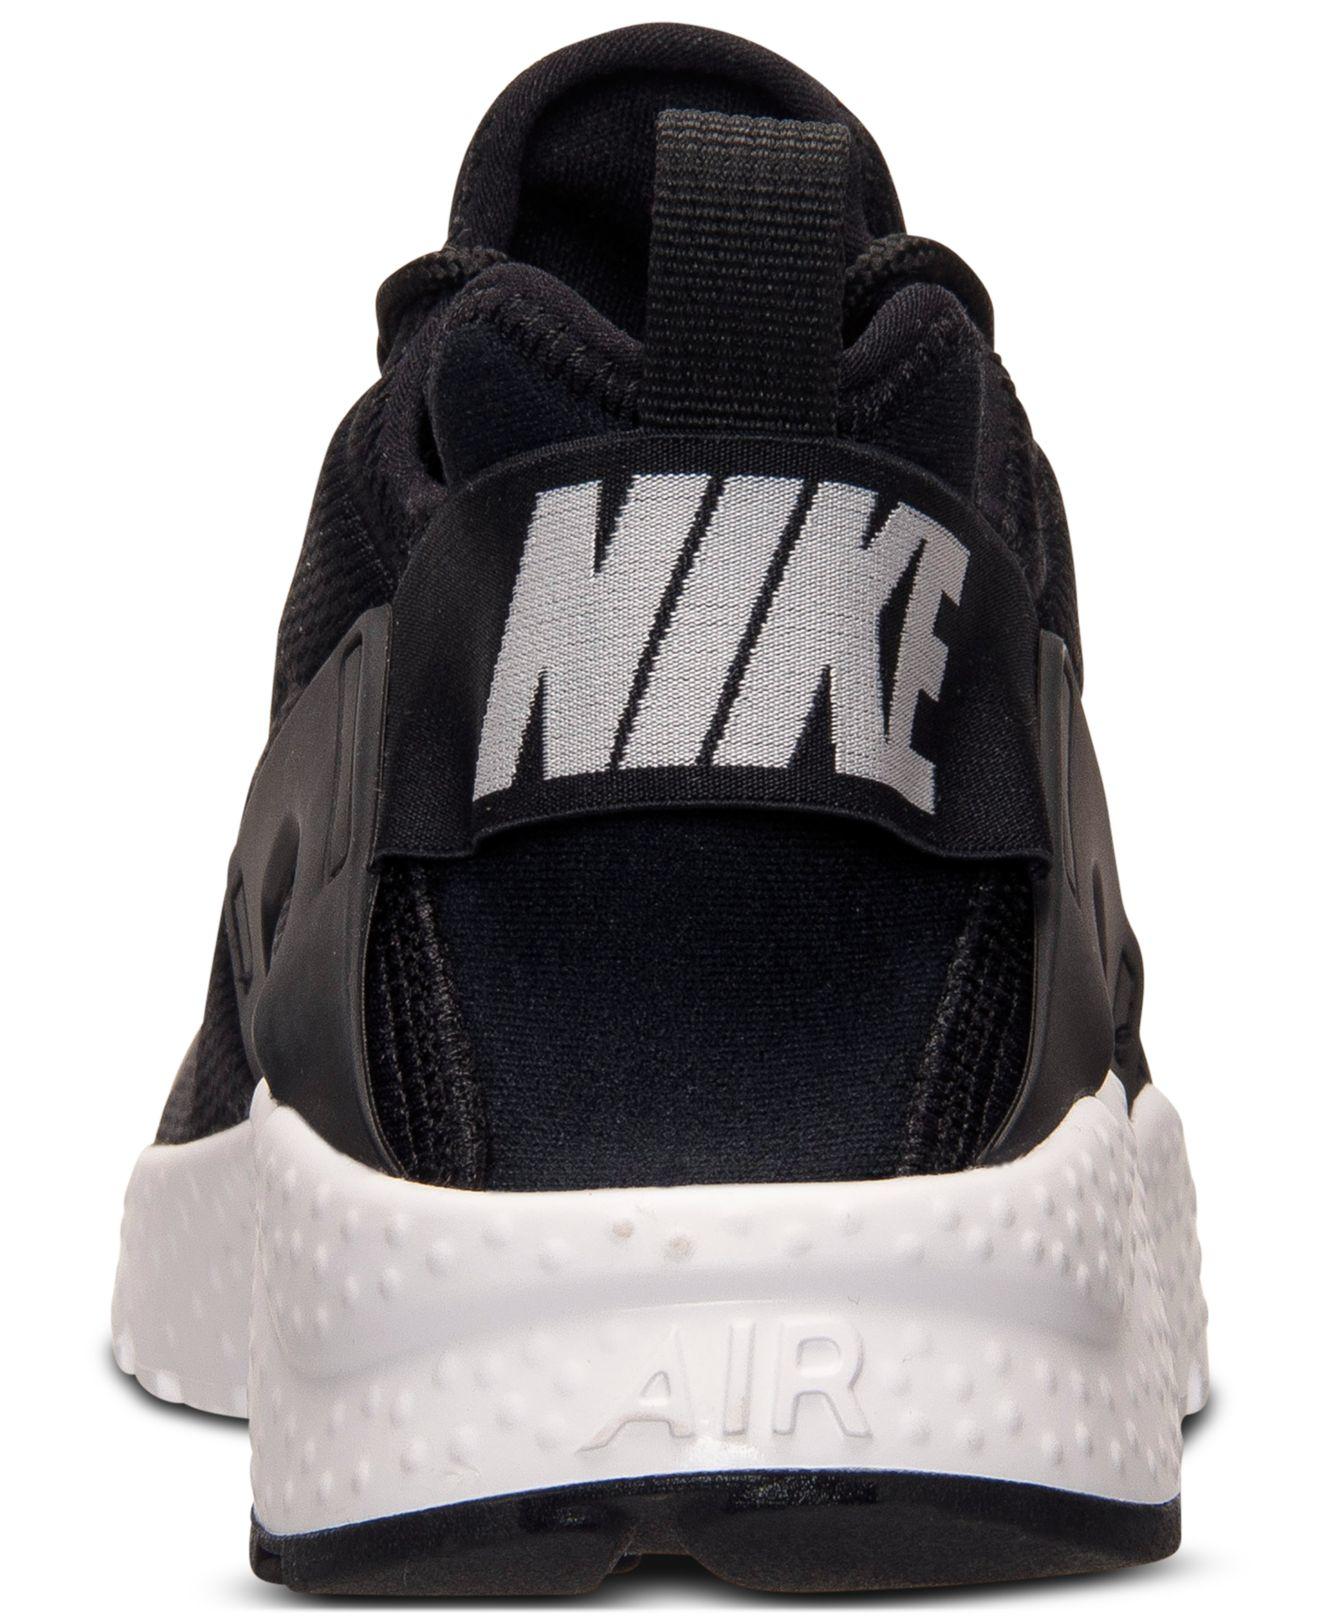 a5e26f7cb25 Lyst - Nike Women s Air Huarache Run Ultra Running Sneakers From ...